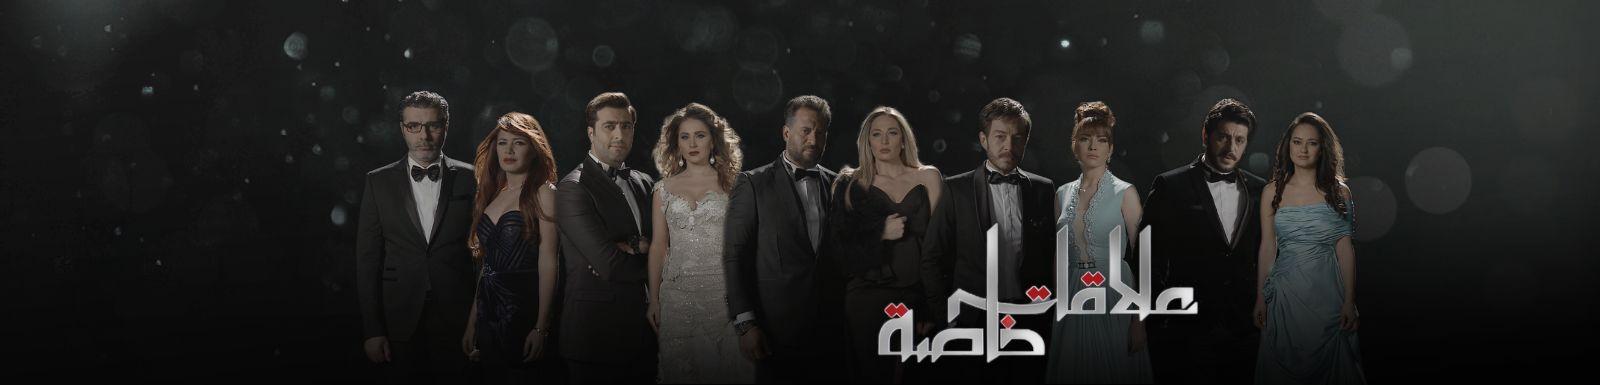 ����� ����� ������ ���� ������ 28 MBC shahid ���� ��